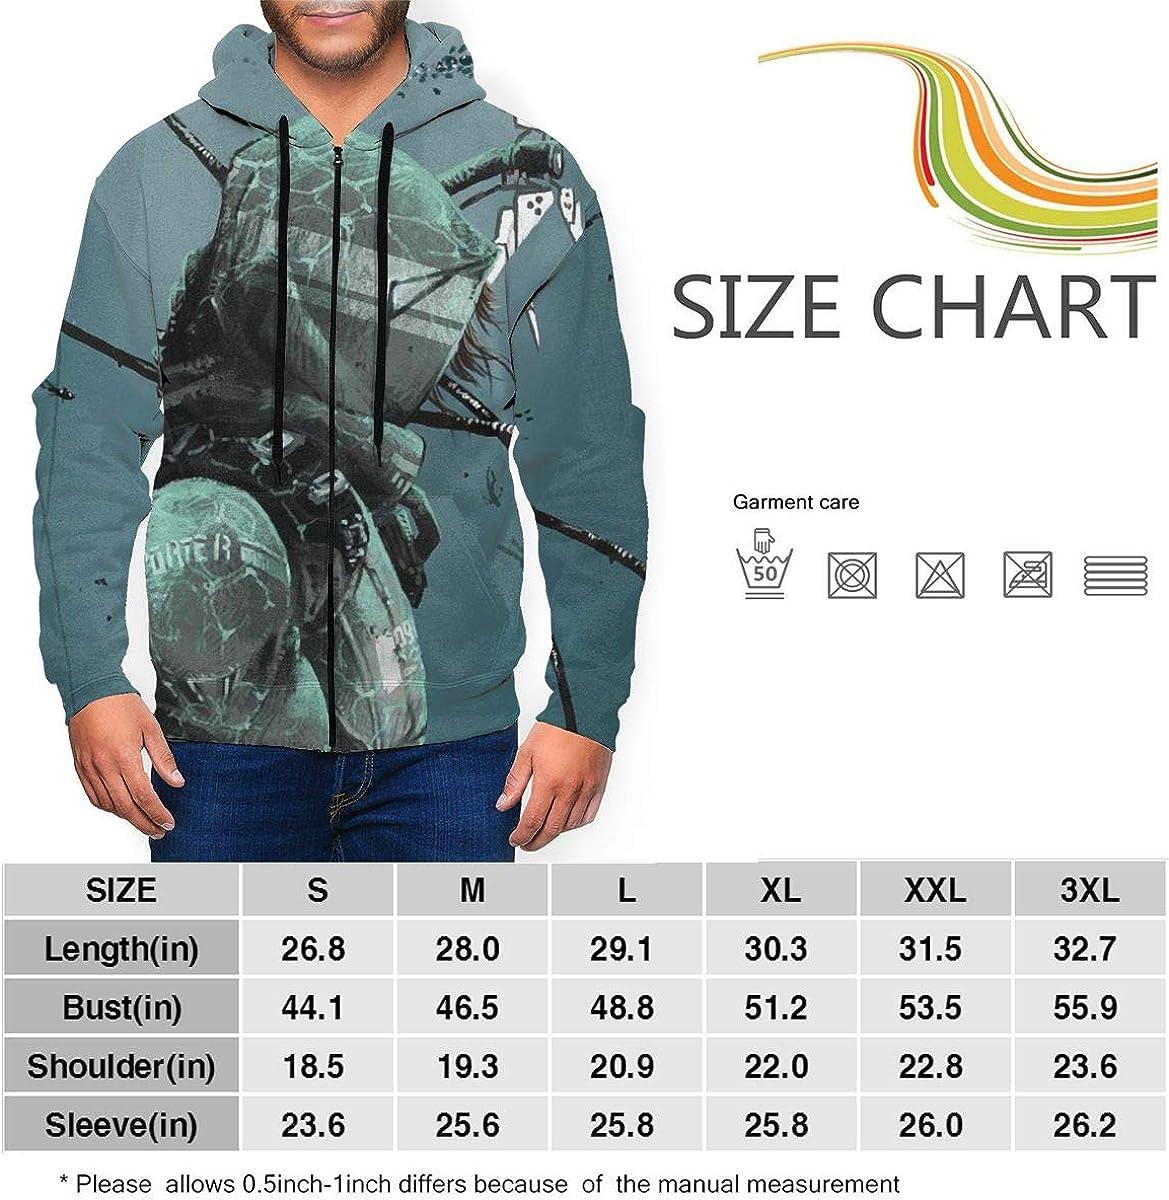 DEA-th stranding Mens Full-Zip Long-Sleeve Hooded Sweatshirt with Pocket,